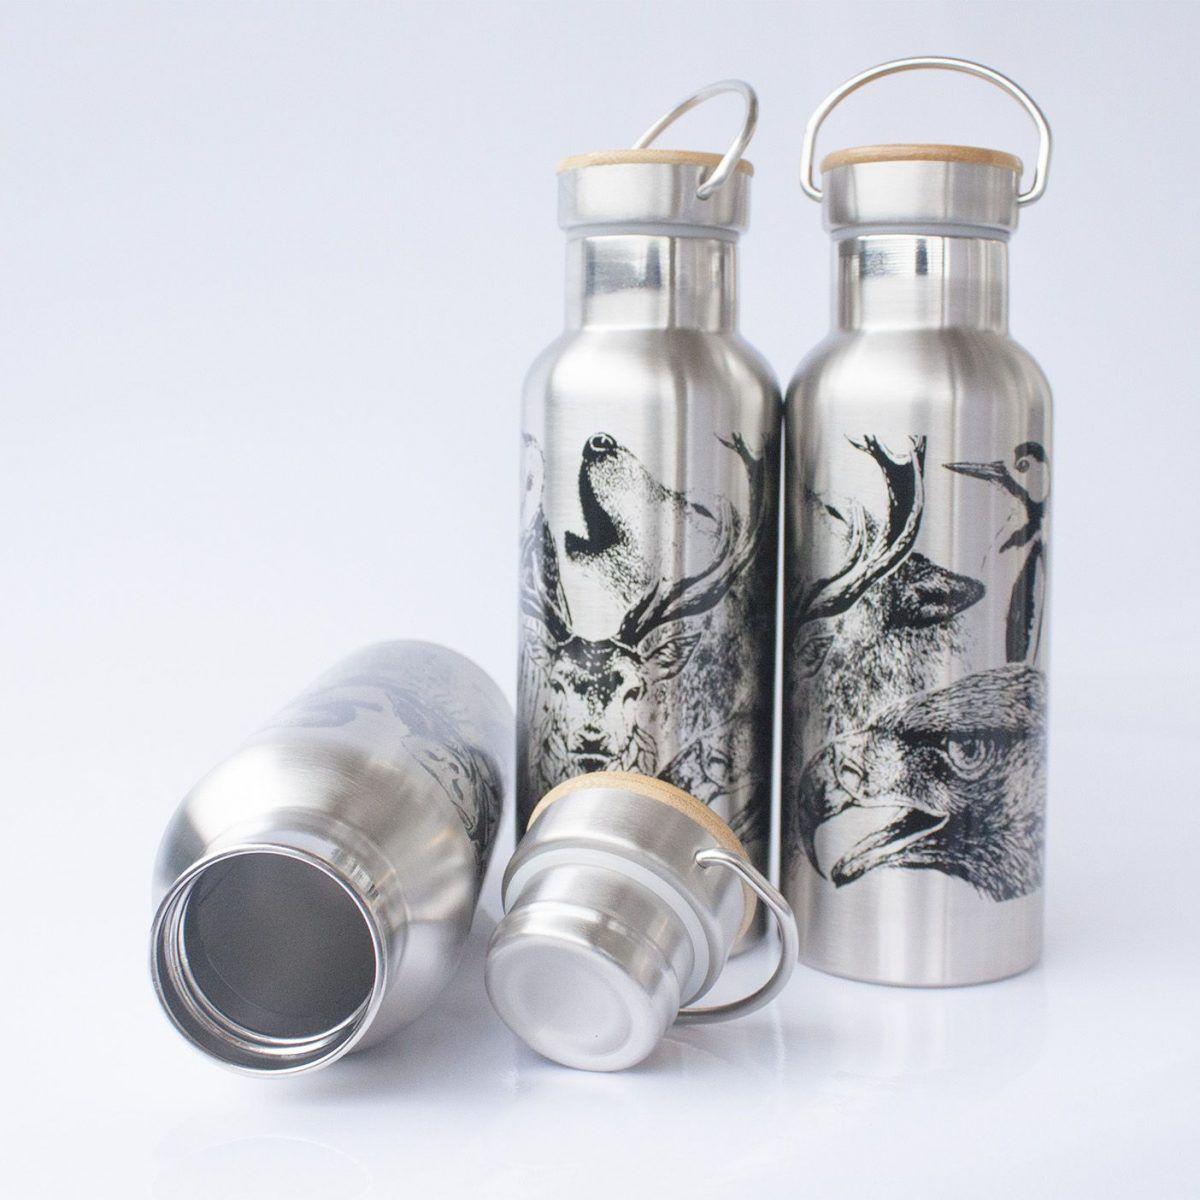 botella termo reutilizable-acero inoxidable-500ml-dibujos animales-zero waste-plata gris